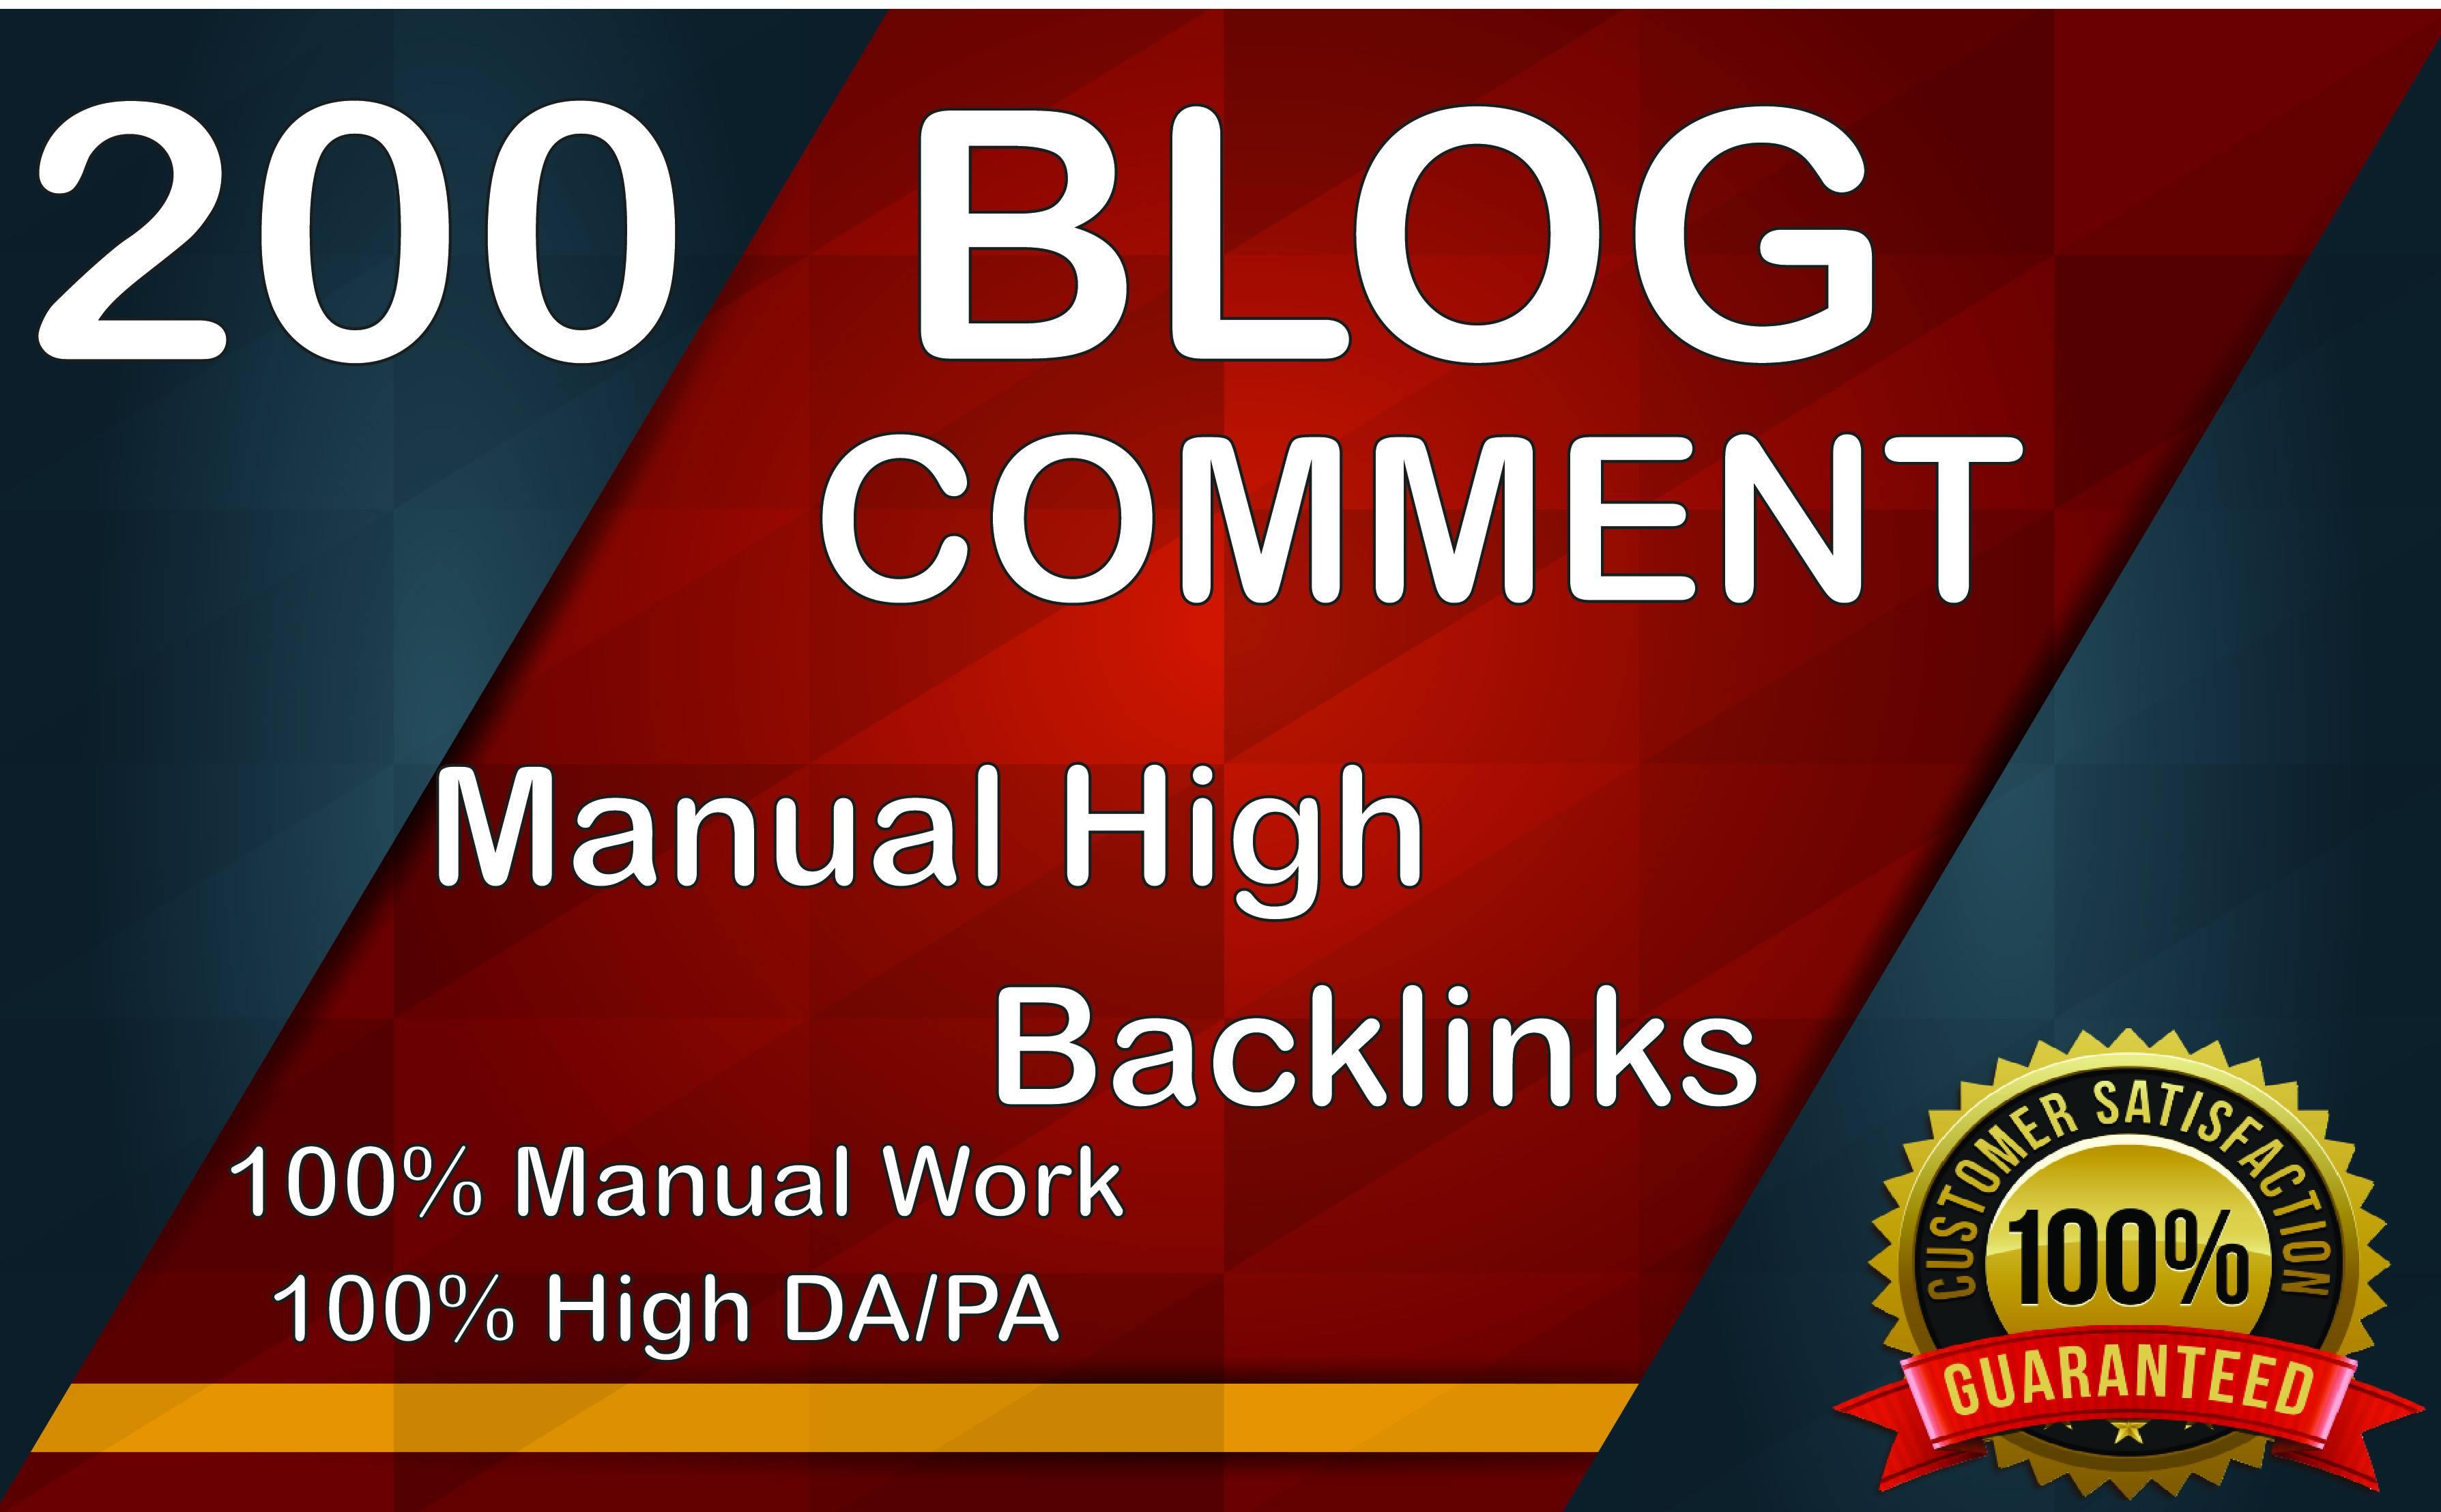 i will make 200 manual blog comment Backlinks Do follow Blog comments DA